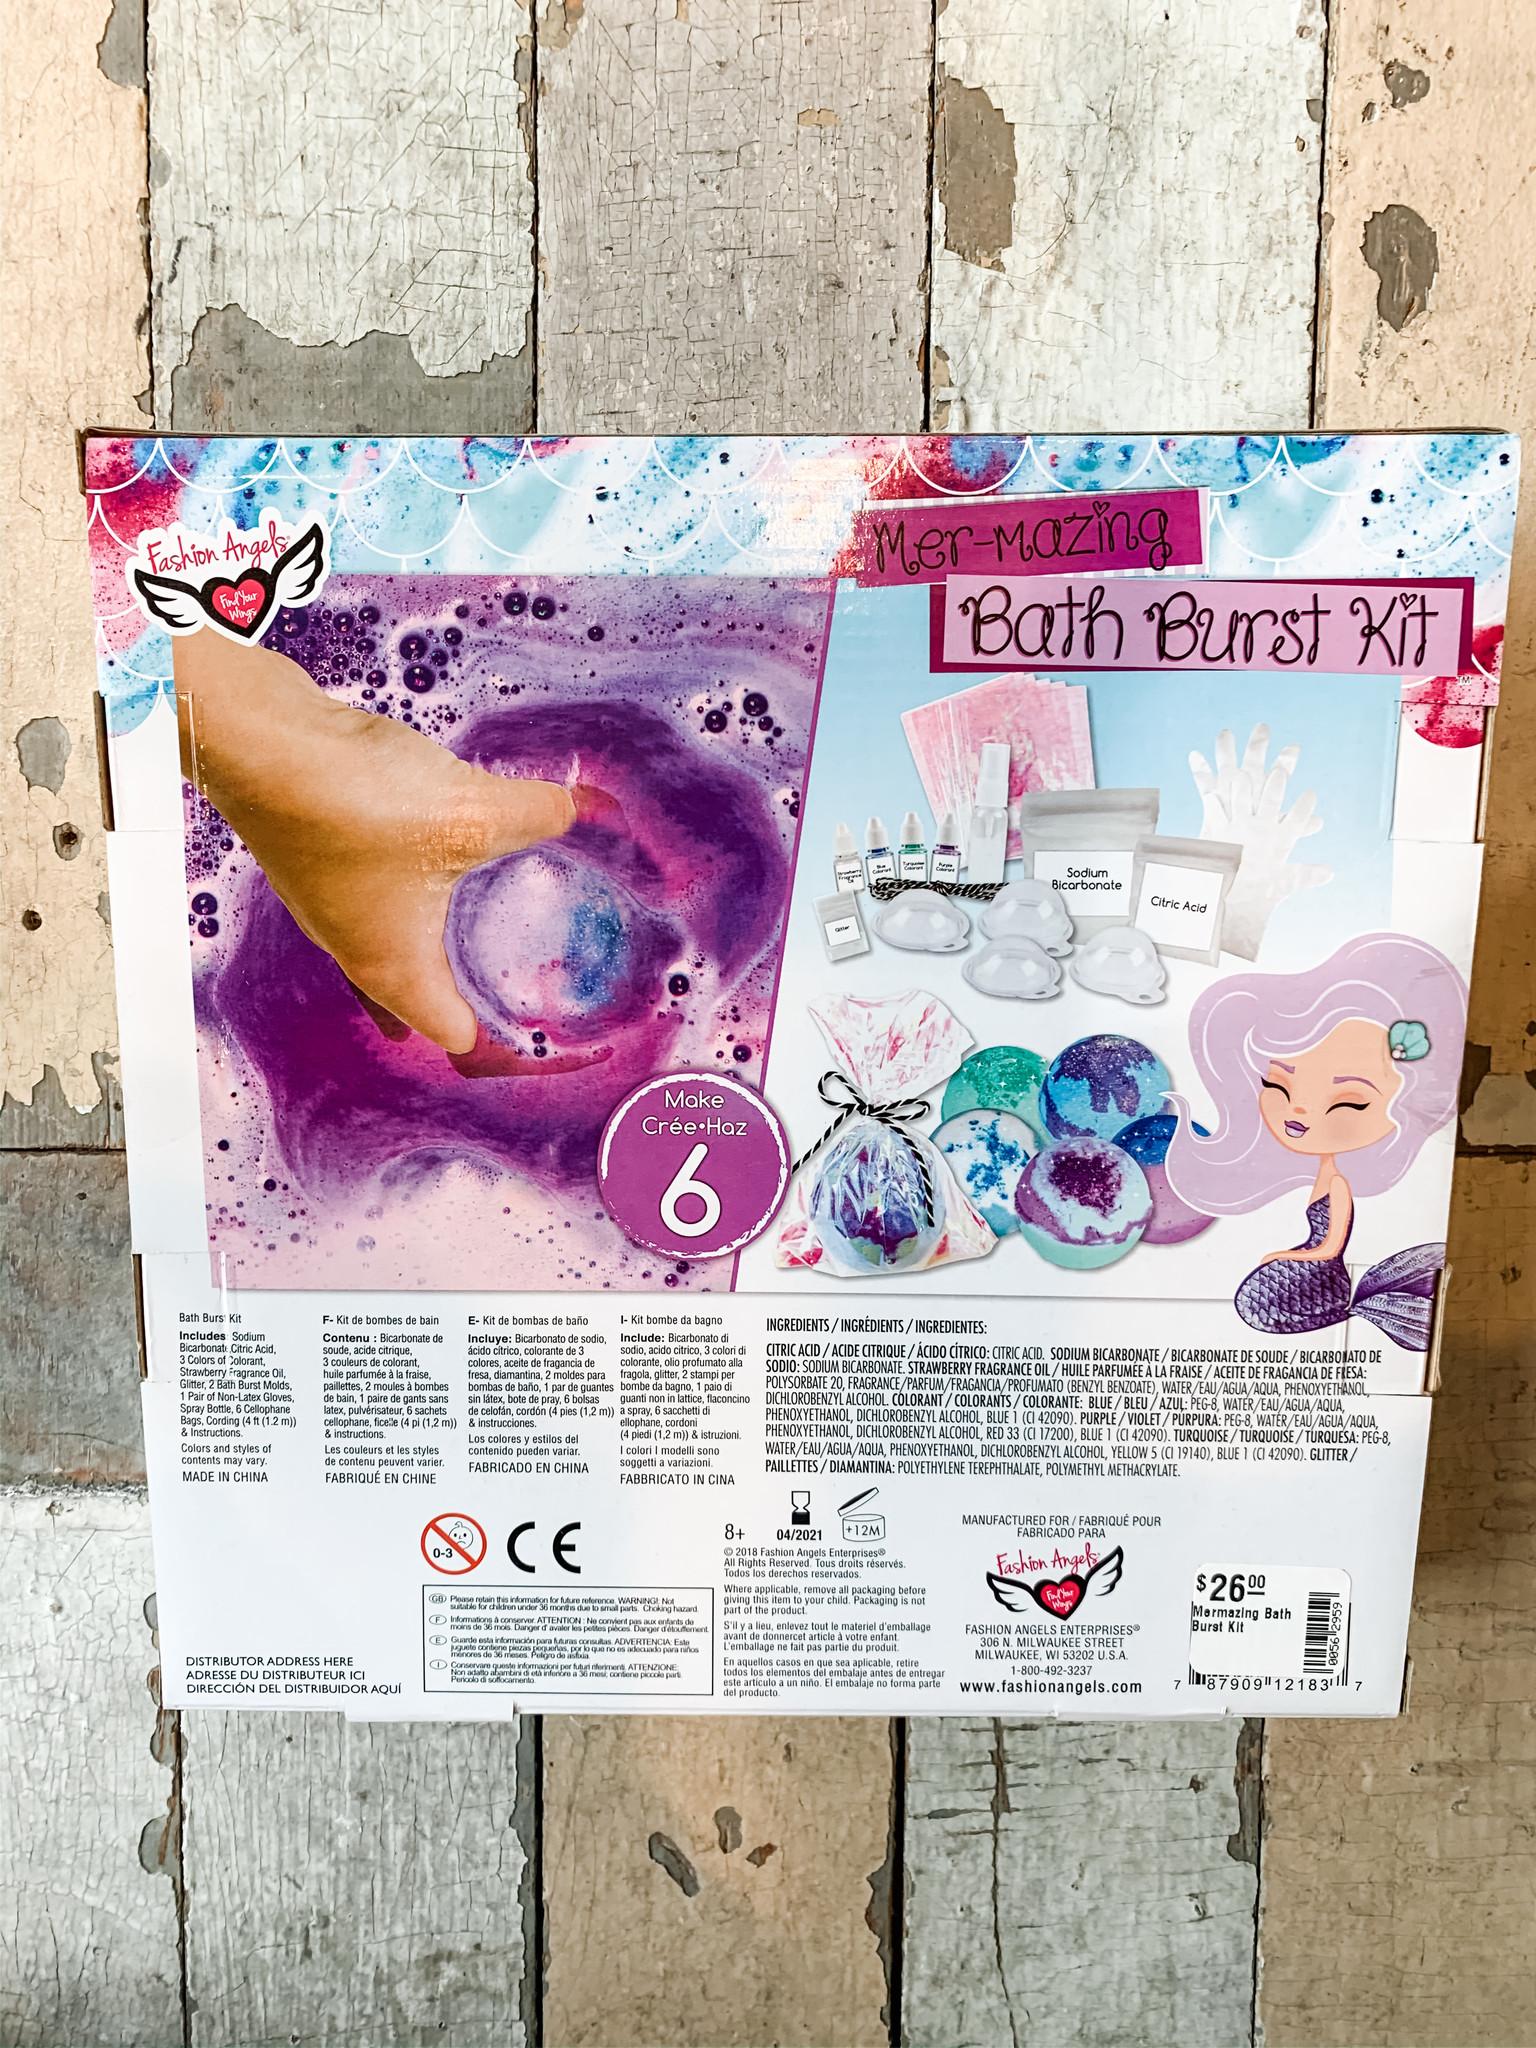 Fashion Angels Mermazing Bath Burst Kit